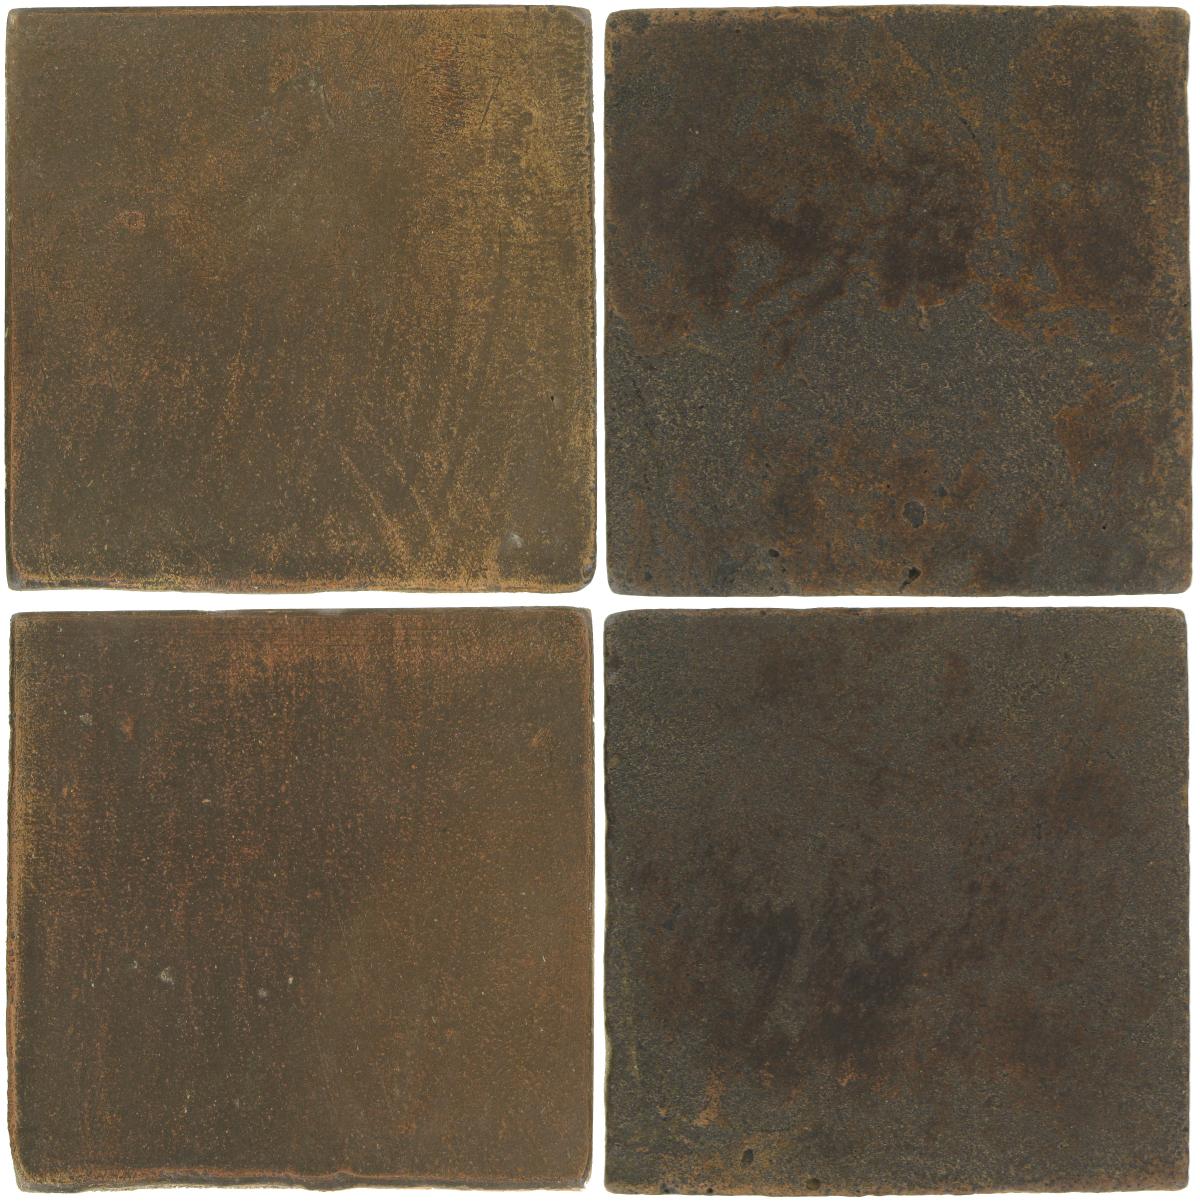 Pedralbes Antique Terracotta  2 Color Combinations  OHS-PSVN Verona Brown + VTG-PSCO Cologne Brown